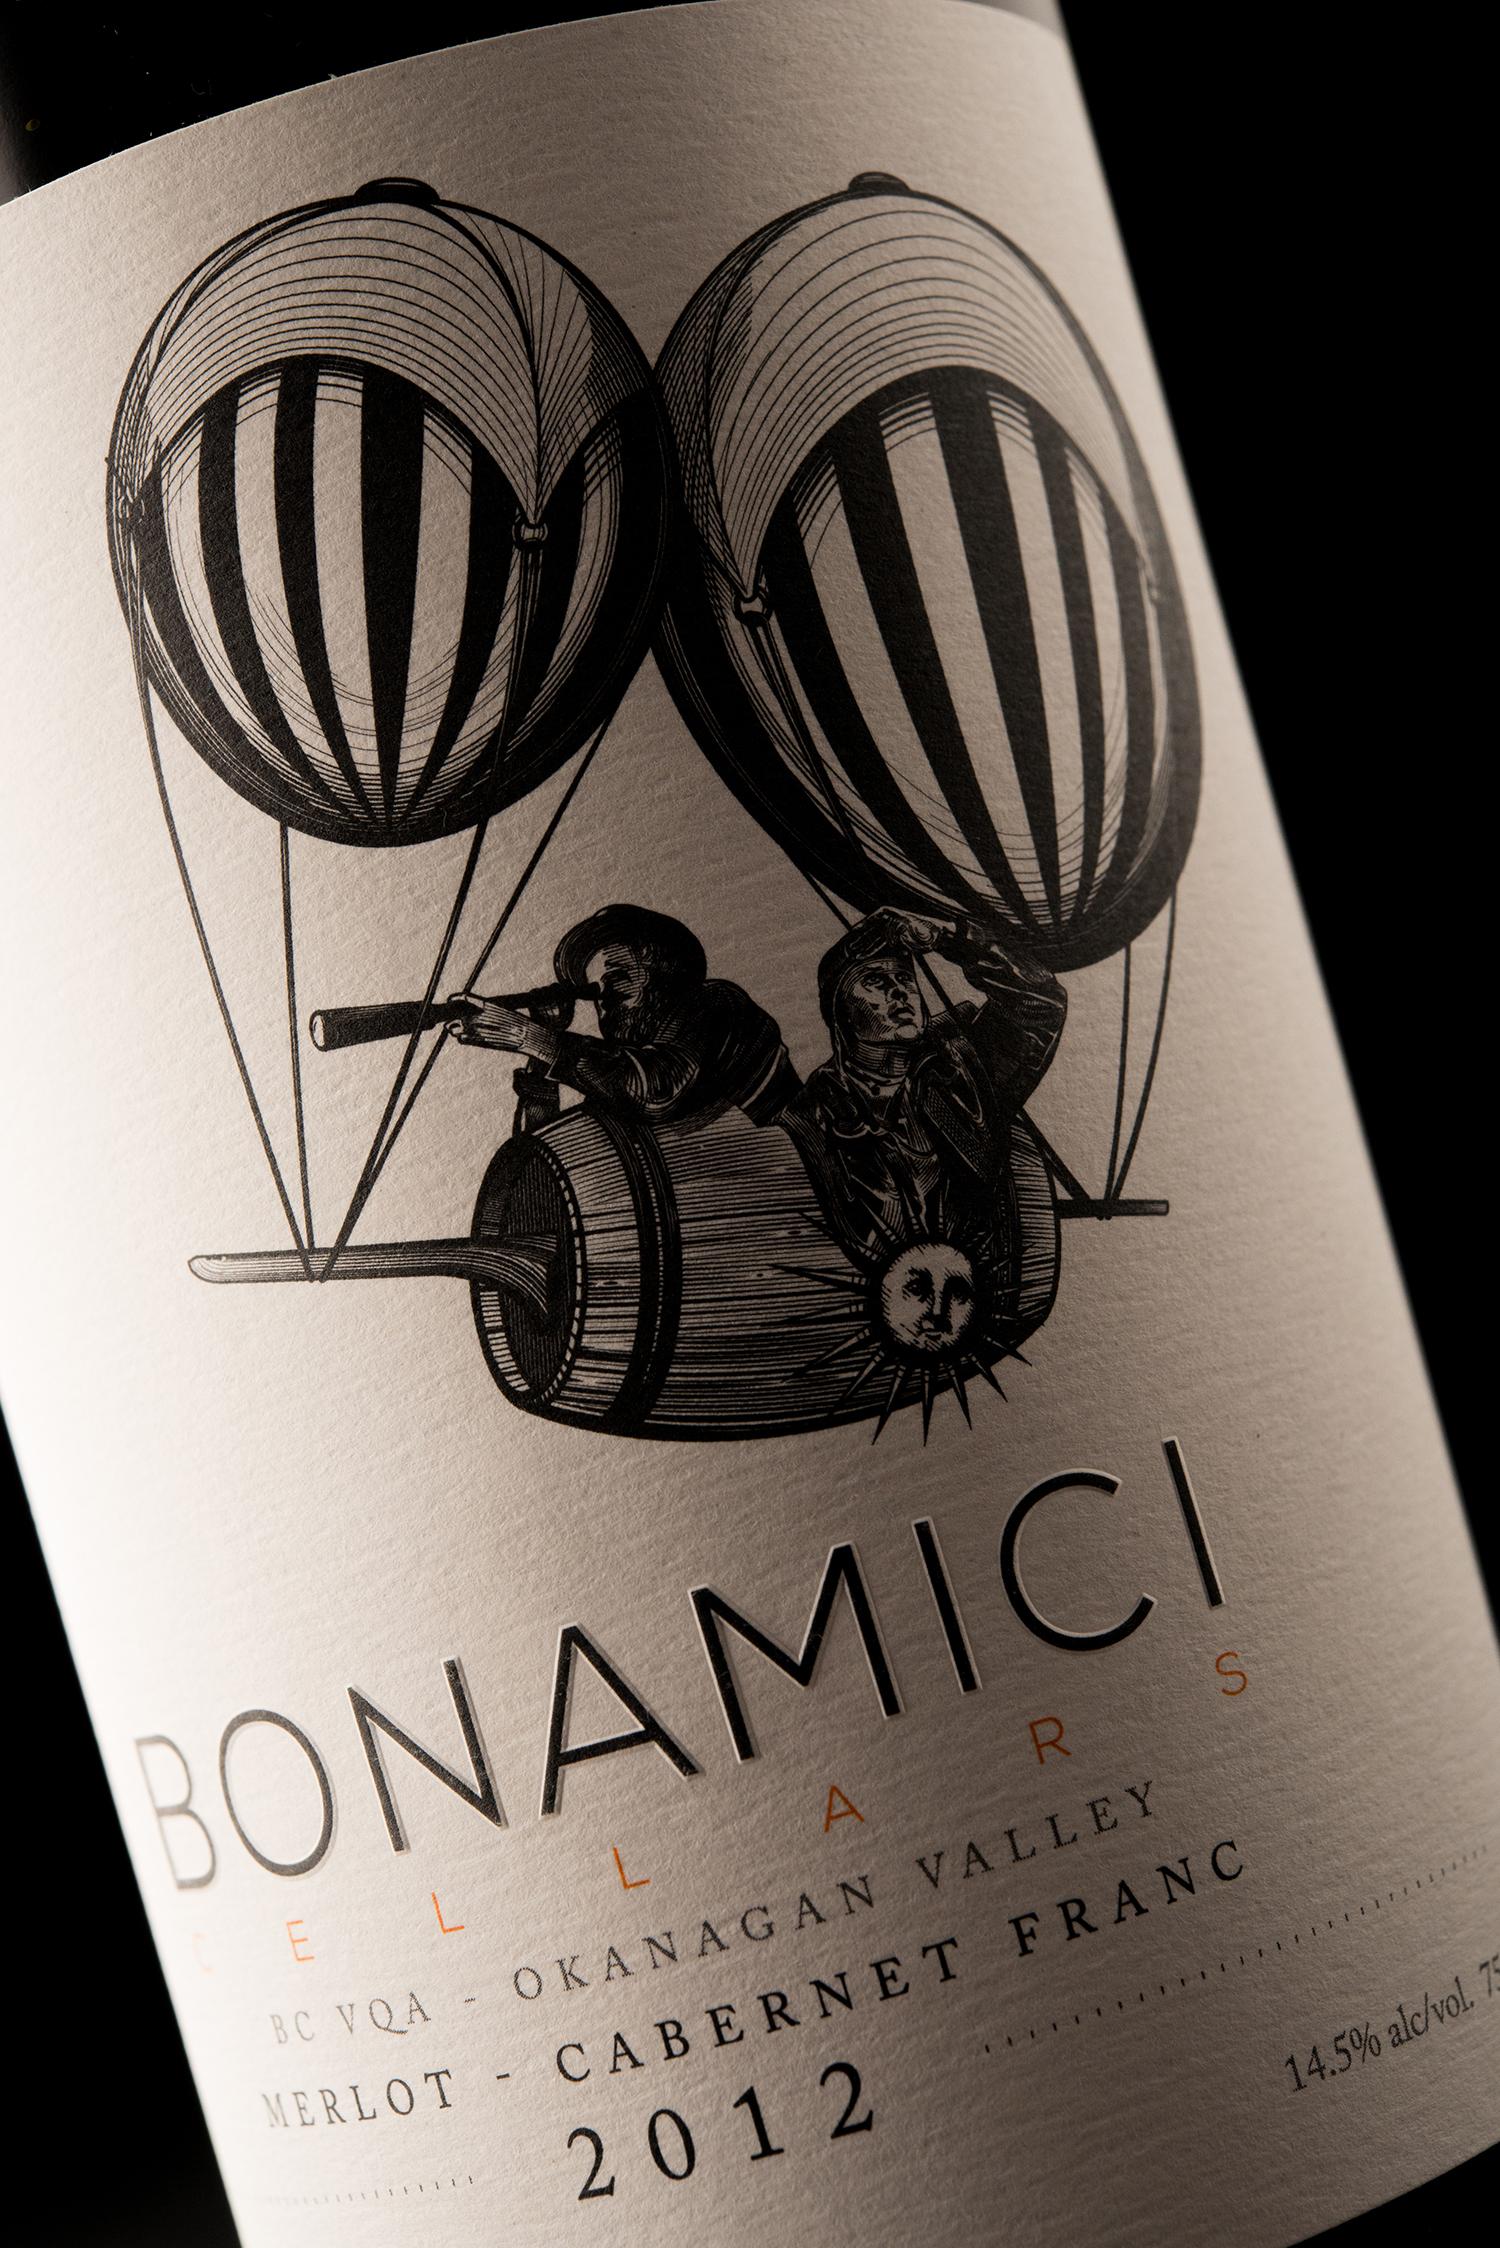 Packaging and Branding Design for Bonamici Cellars